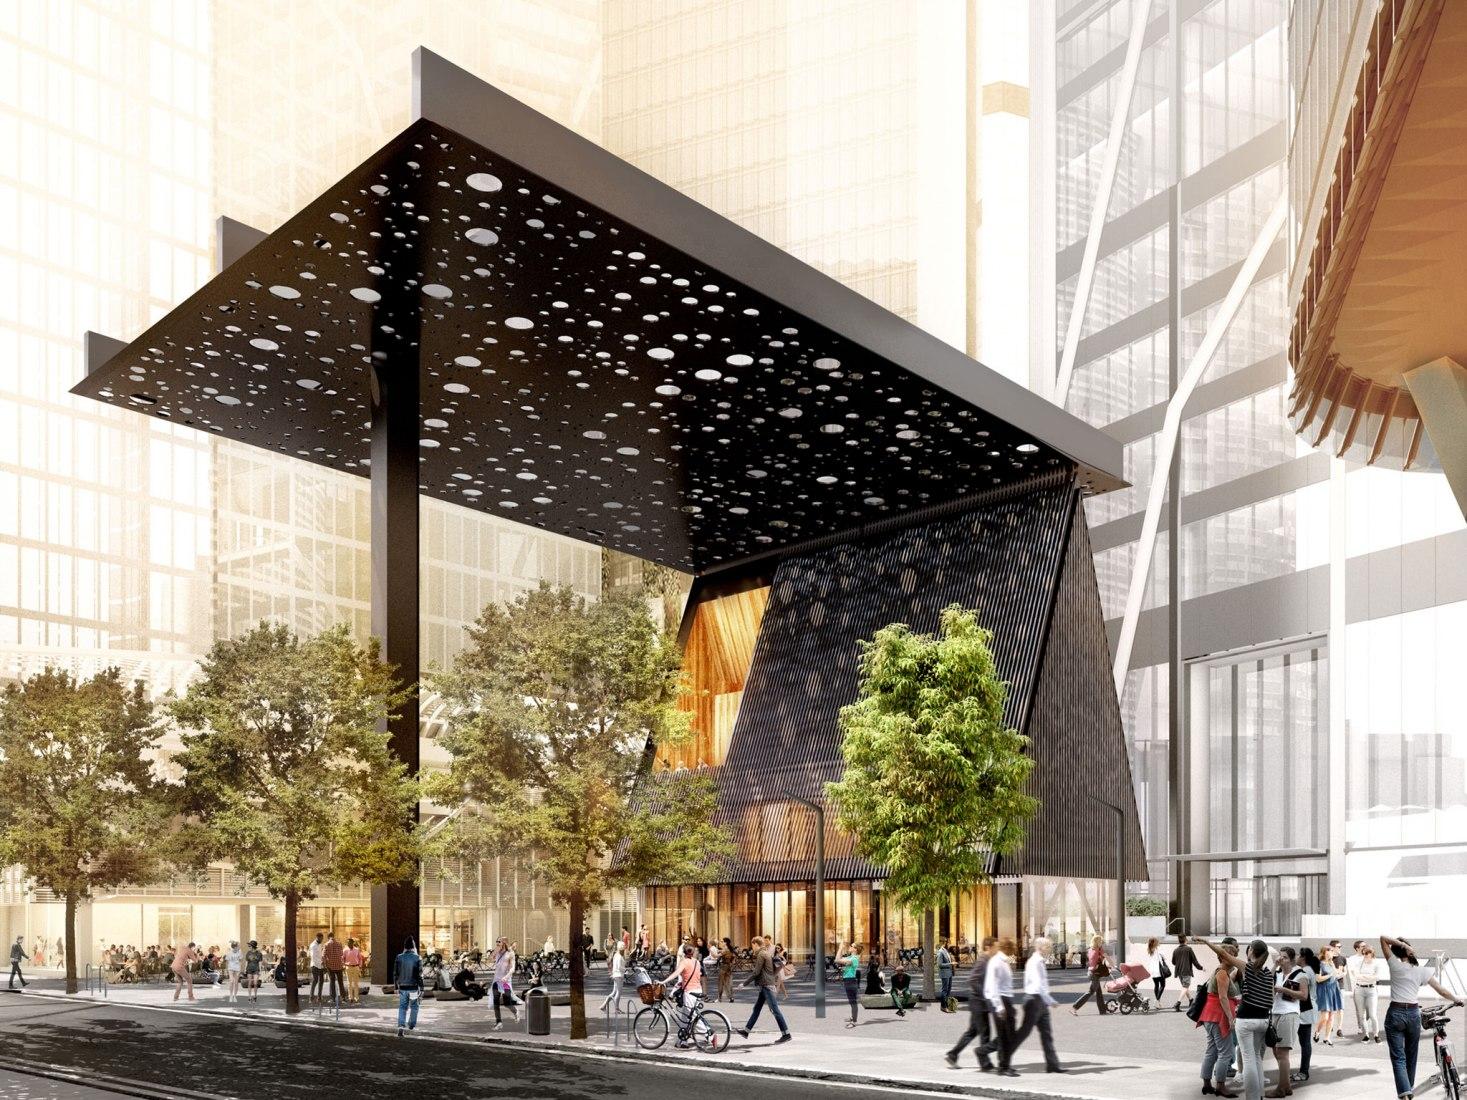 Rendering. New Sydney Plaza Adjaye Associates+ Daniel Boyd. Image courtesy of Adjaye Associates